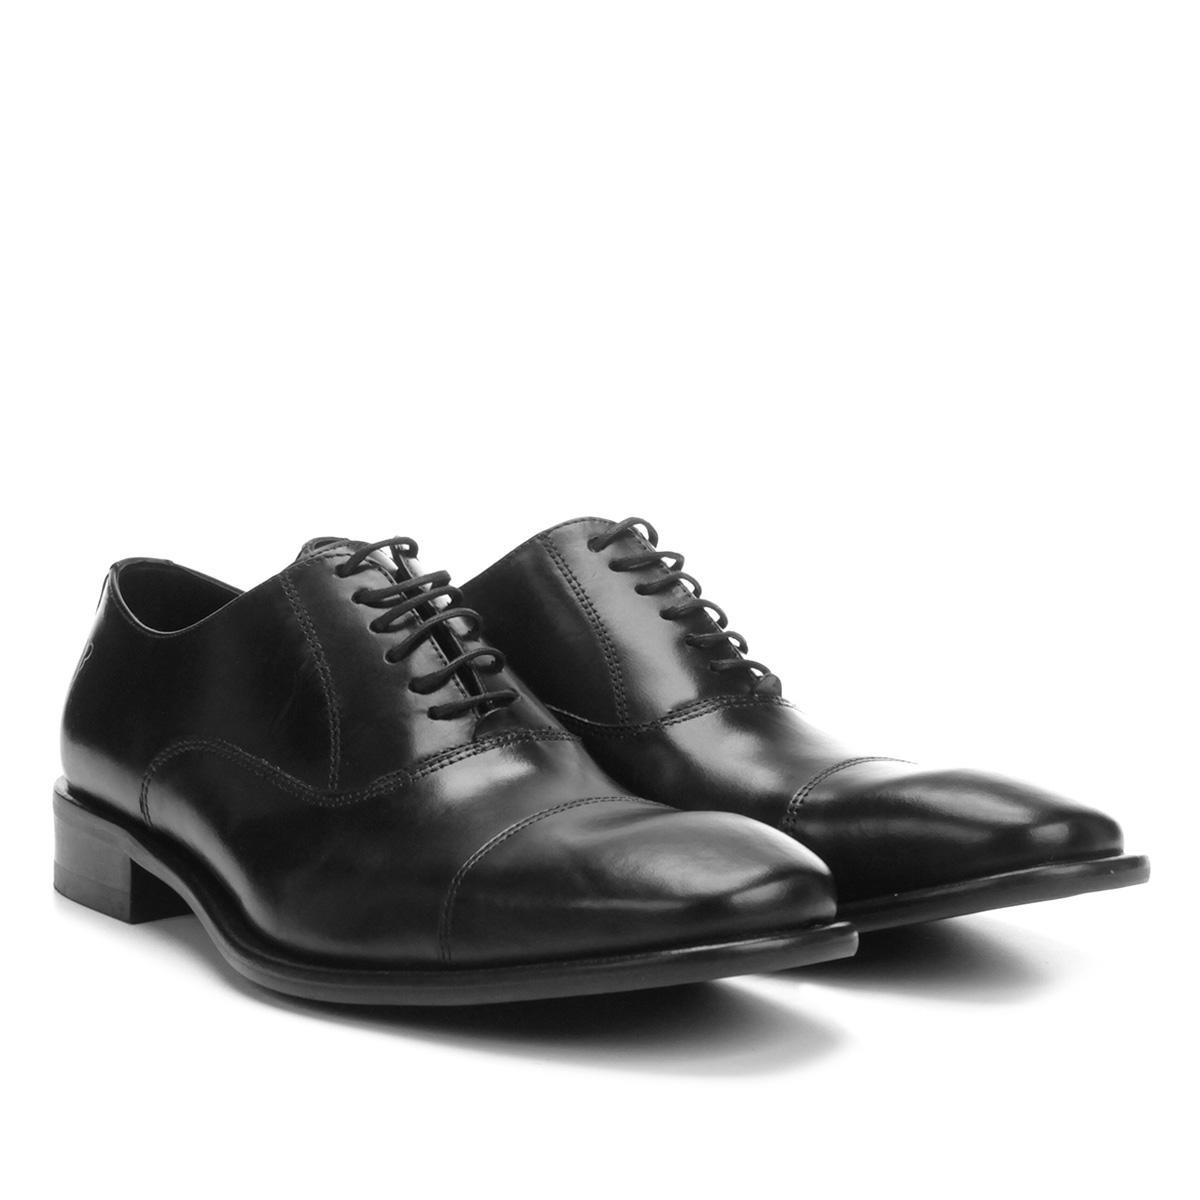 5b945a2879 sapato social couro vr oxford biqueira. Carregando zoom.